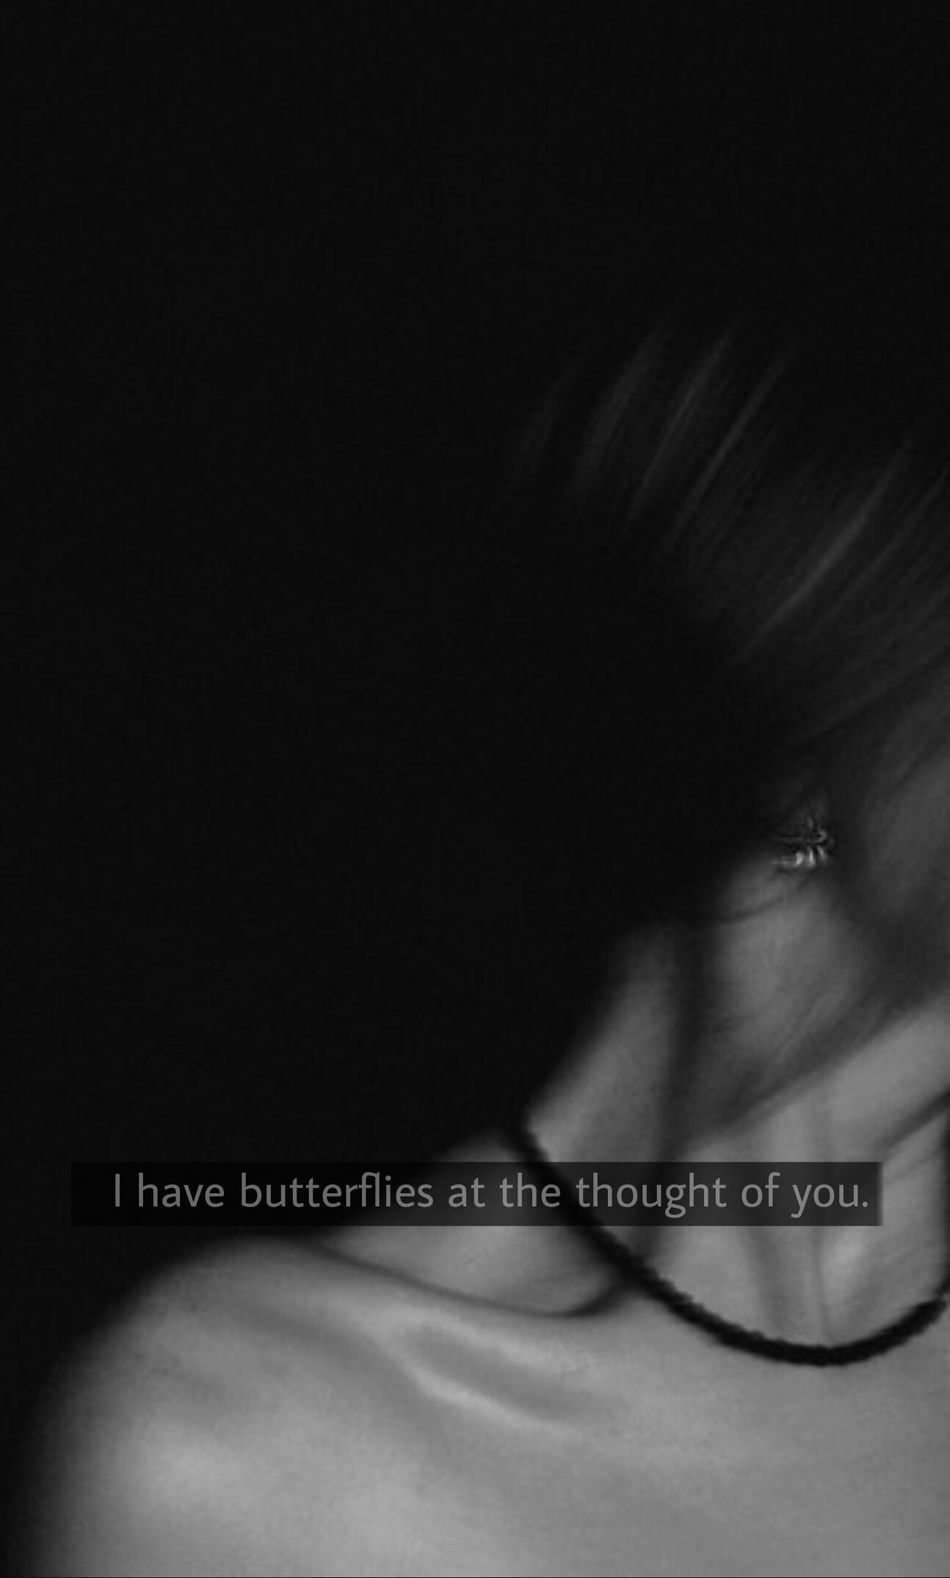 Darkness And Light Sadpoetry Black Lostplaces Memories Feelinglost Loneliness Lost Lonelymountain Blackandwhite Brokensoul Darkthoughts B&w Darkpath